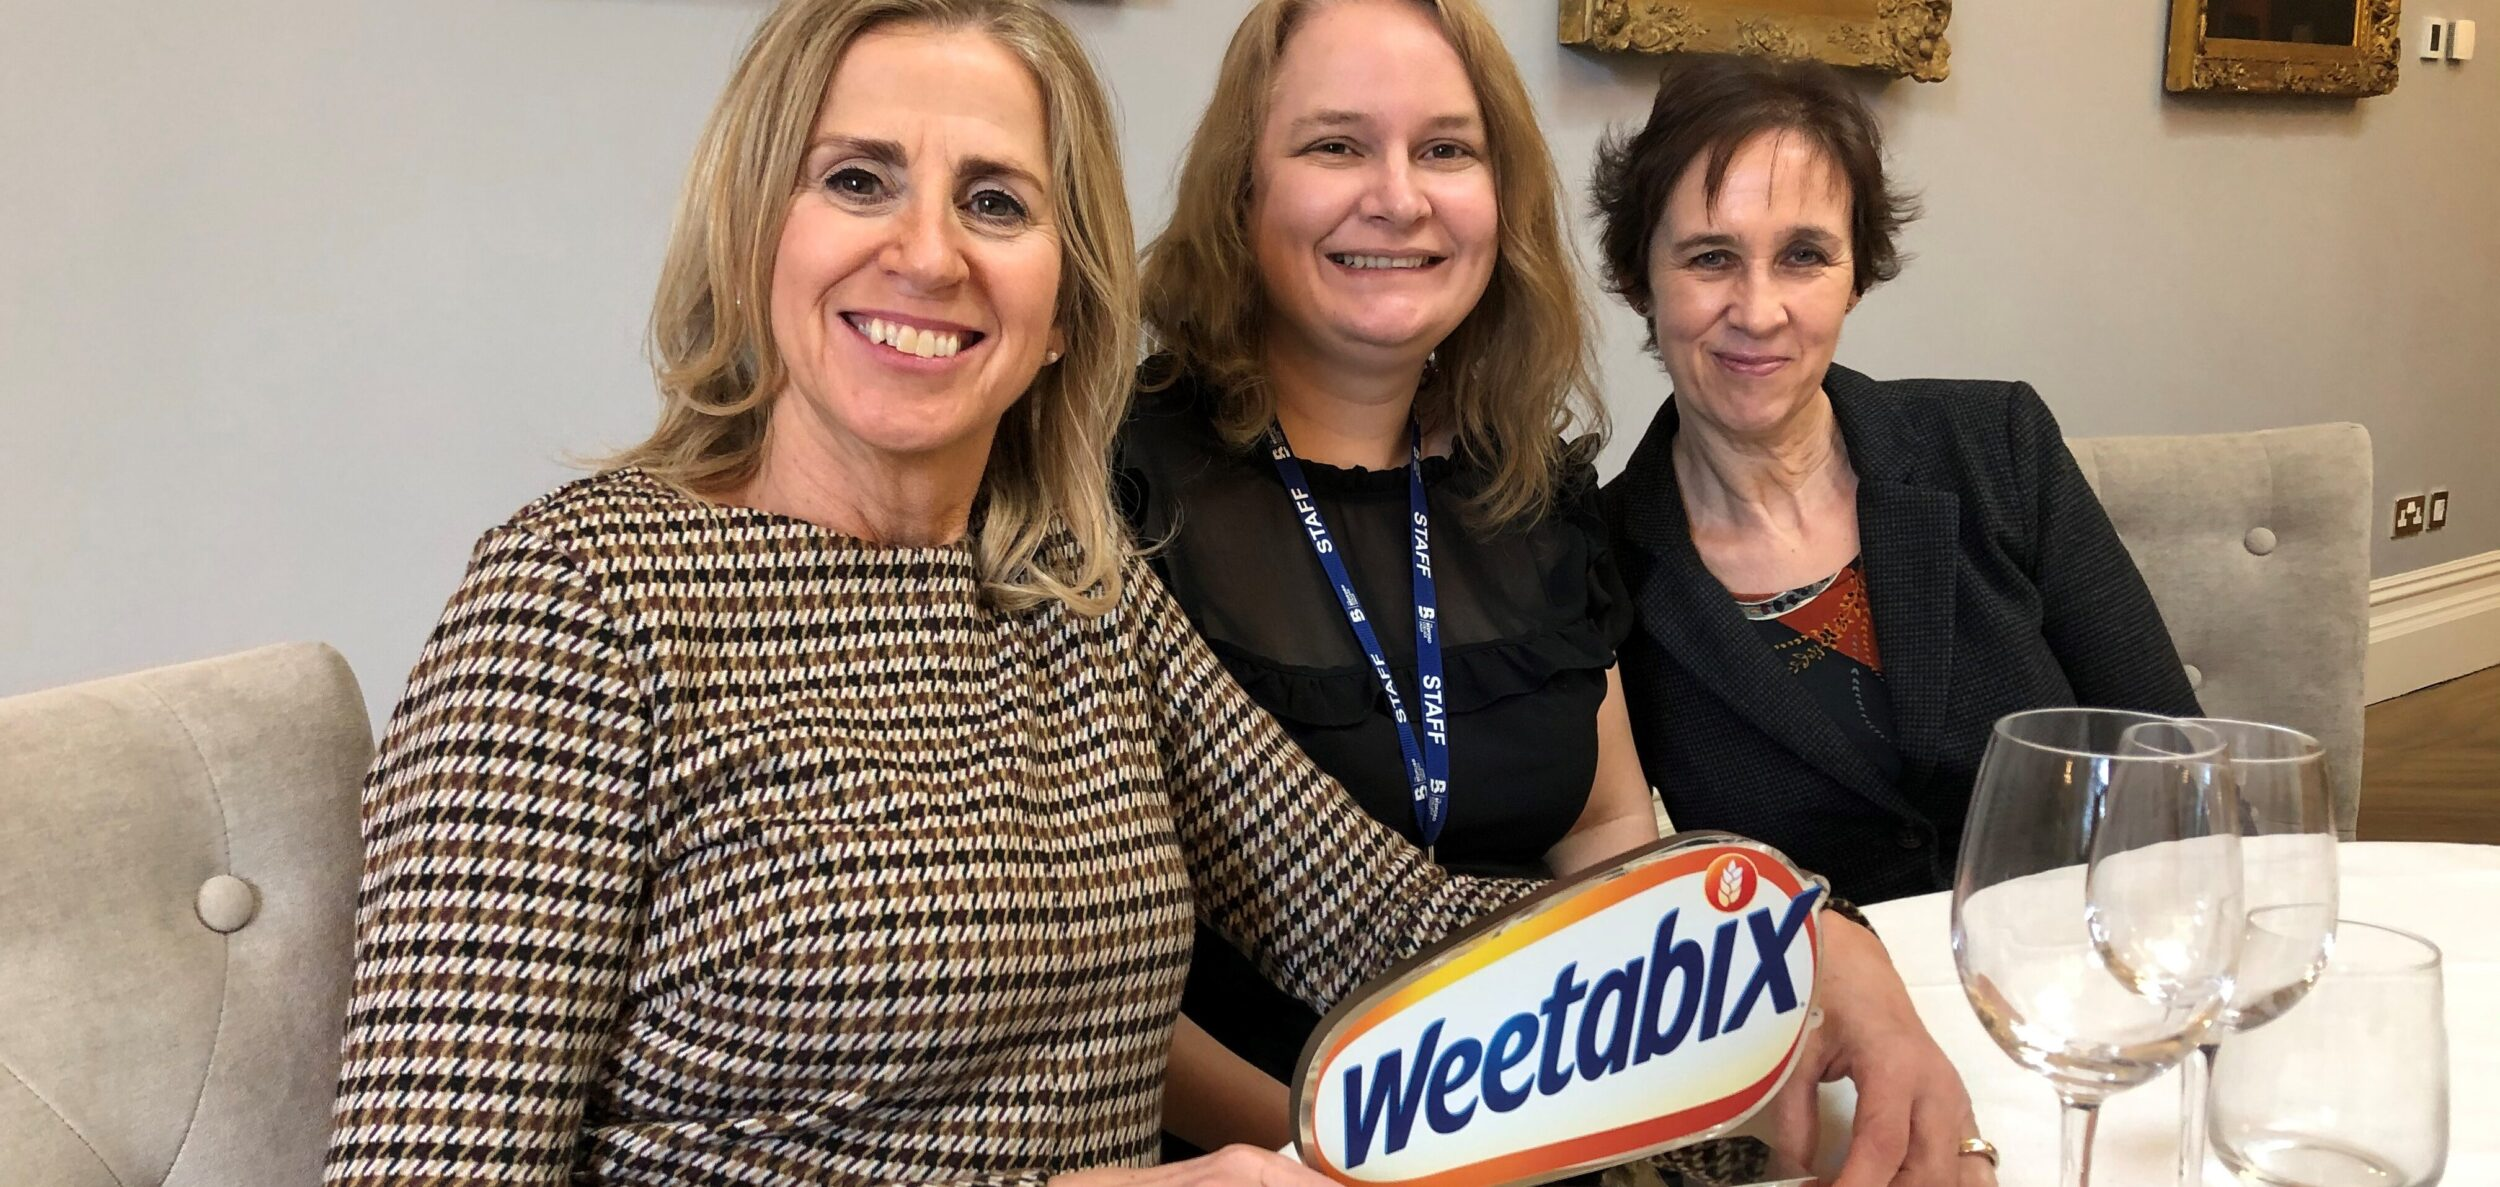 Banner image Star supplier to Weetabix PR story